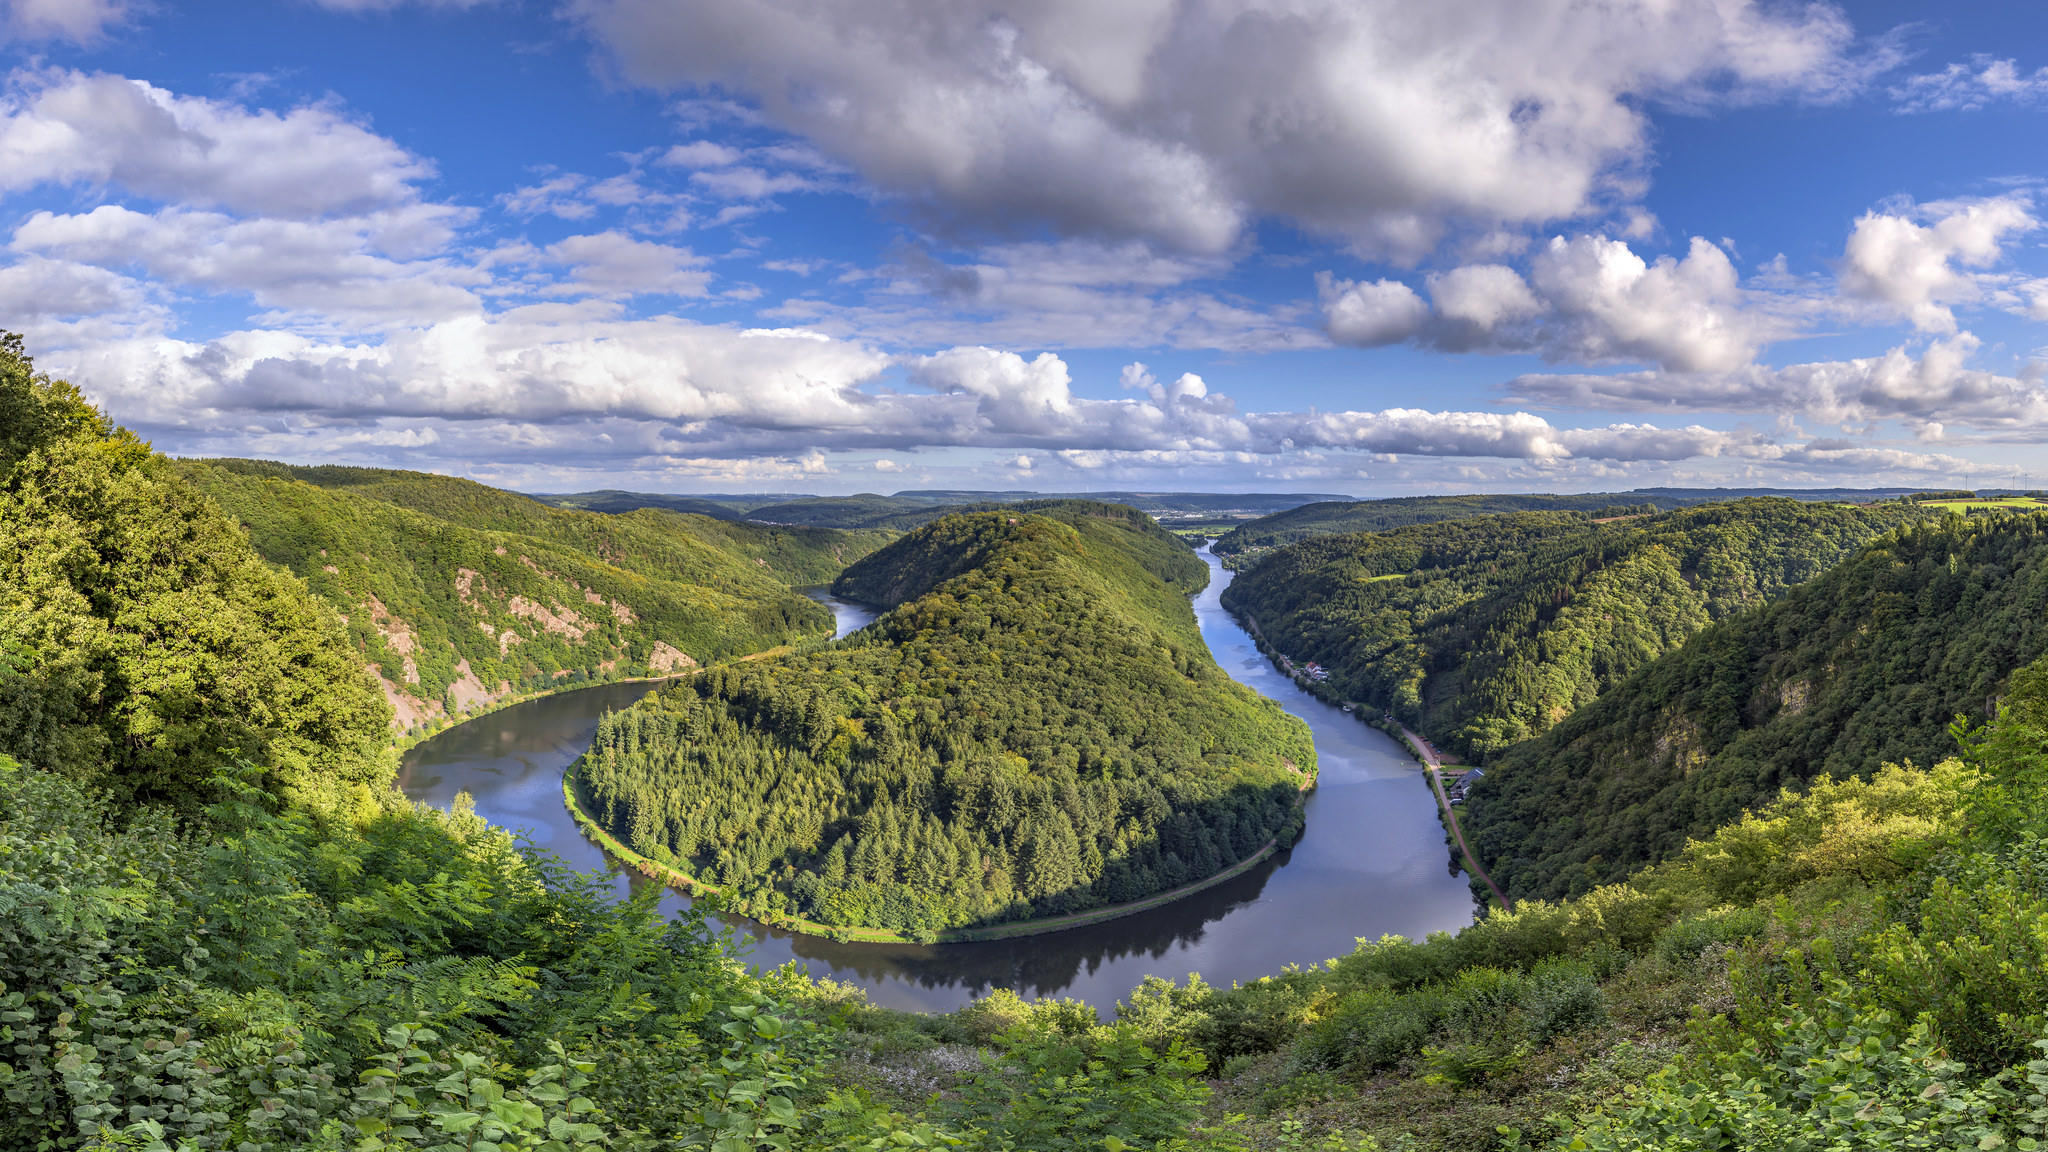 Обои Saarschleife, река Саар, Метлах, Оршхольц